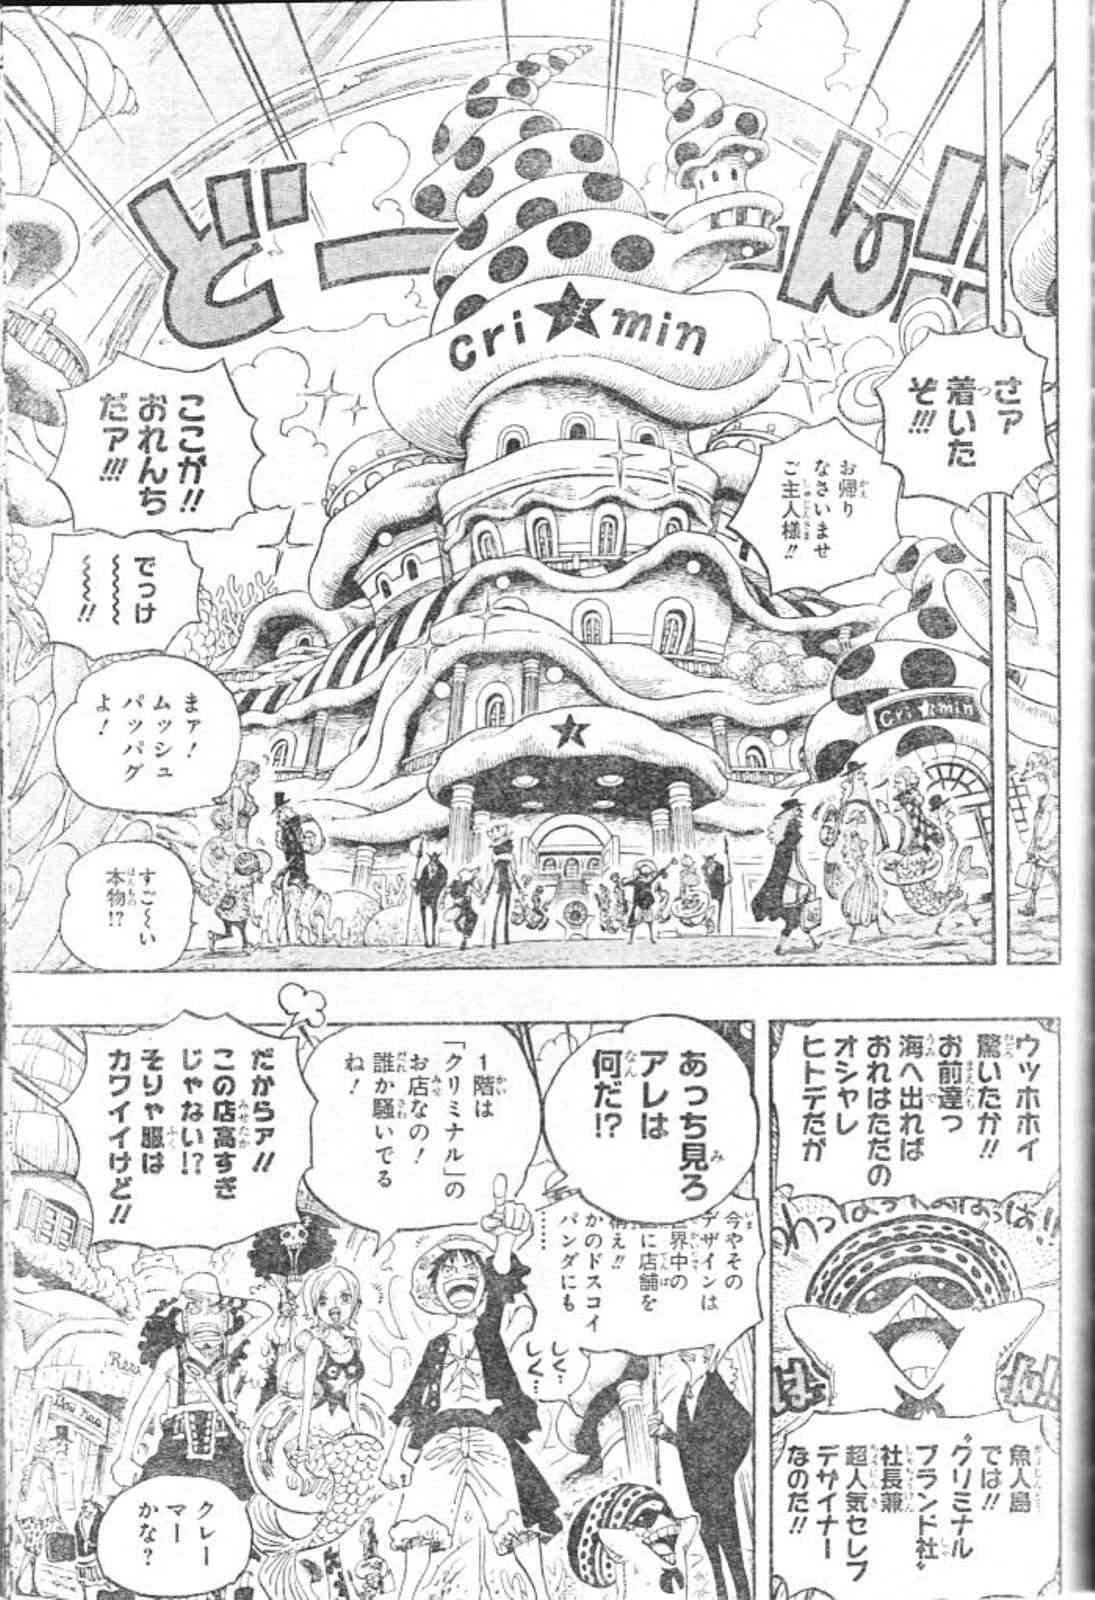 One Piece Manga 611 Spoiler Pics 07_raw10